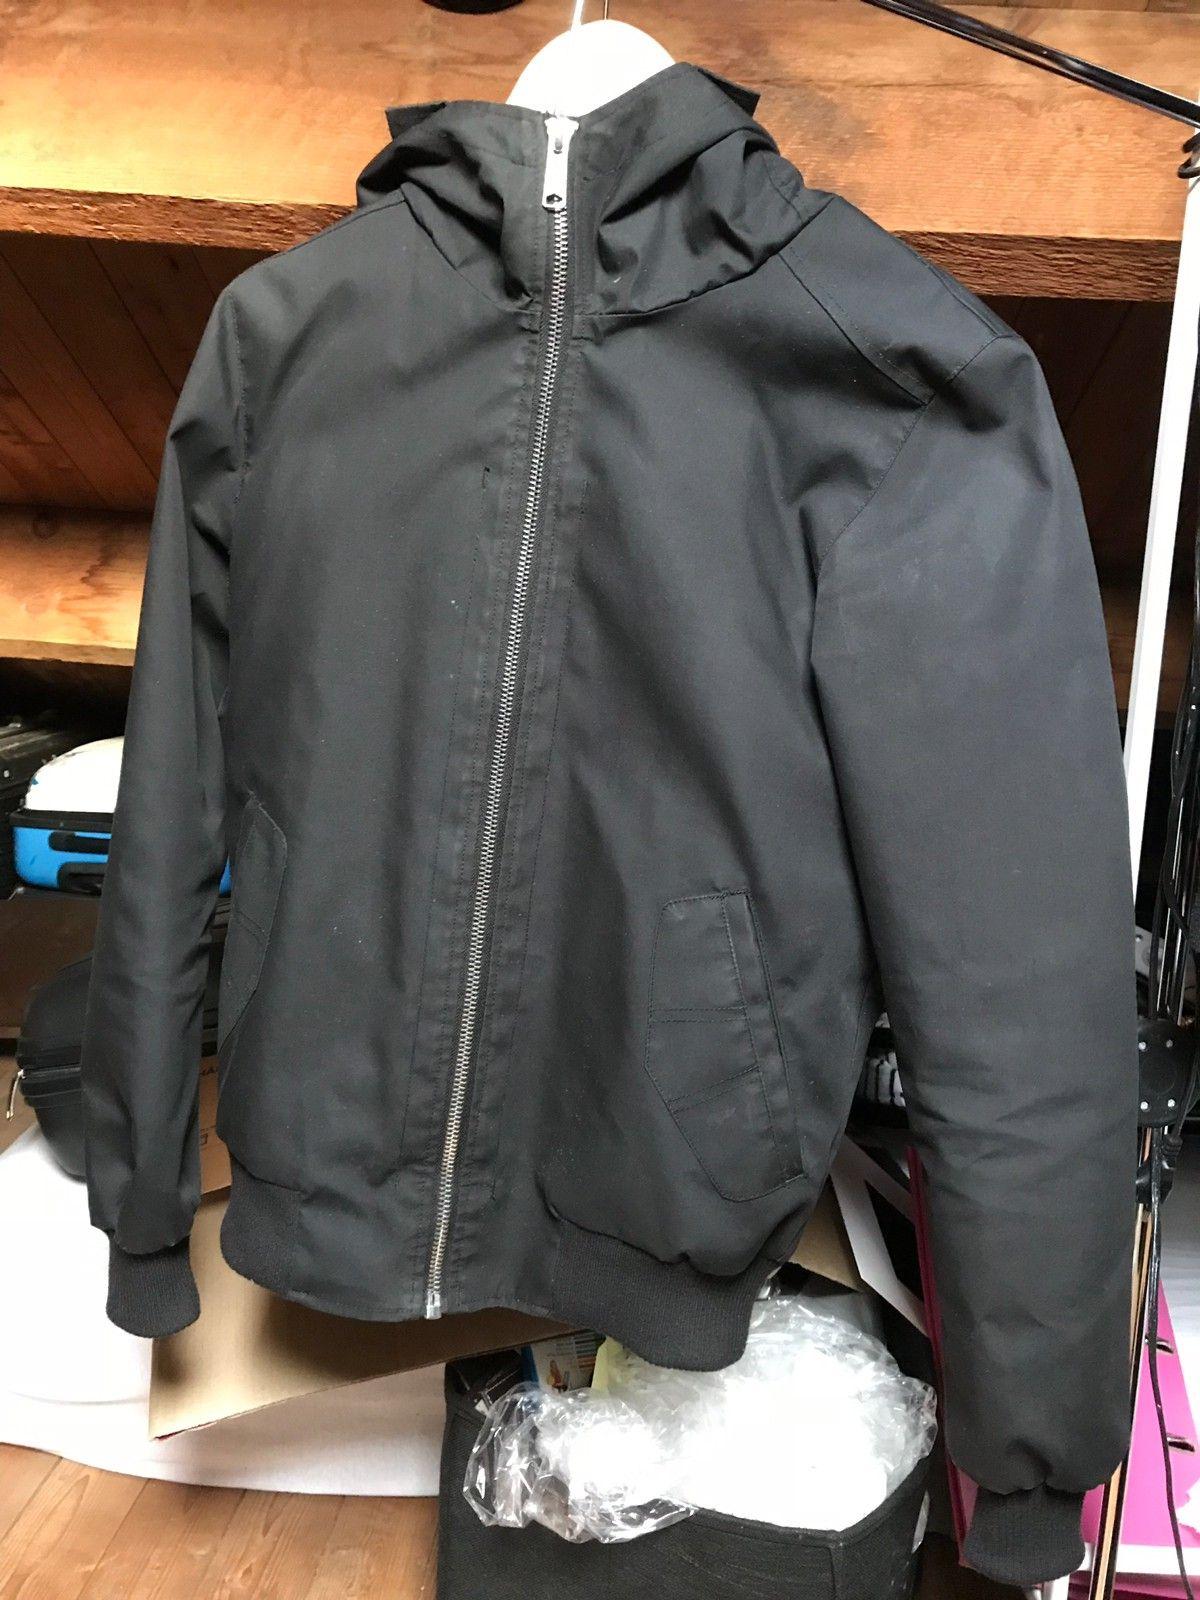 c9a2653a Svart jakke kjøpt i sin tid på Carlings av merket Vailent. Pent ...